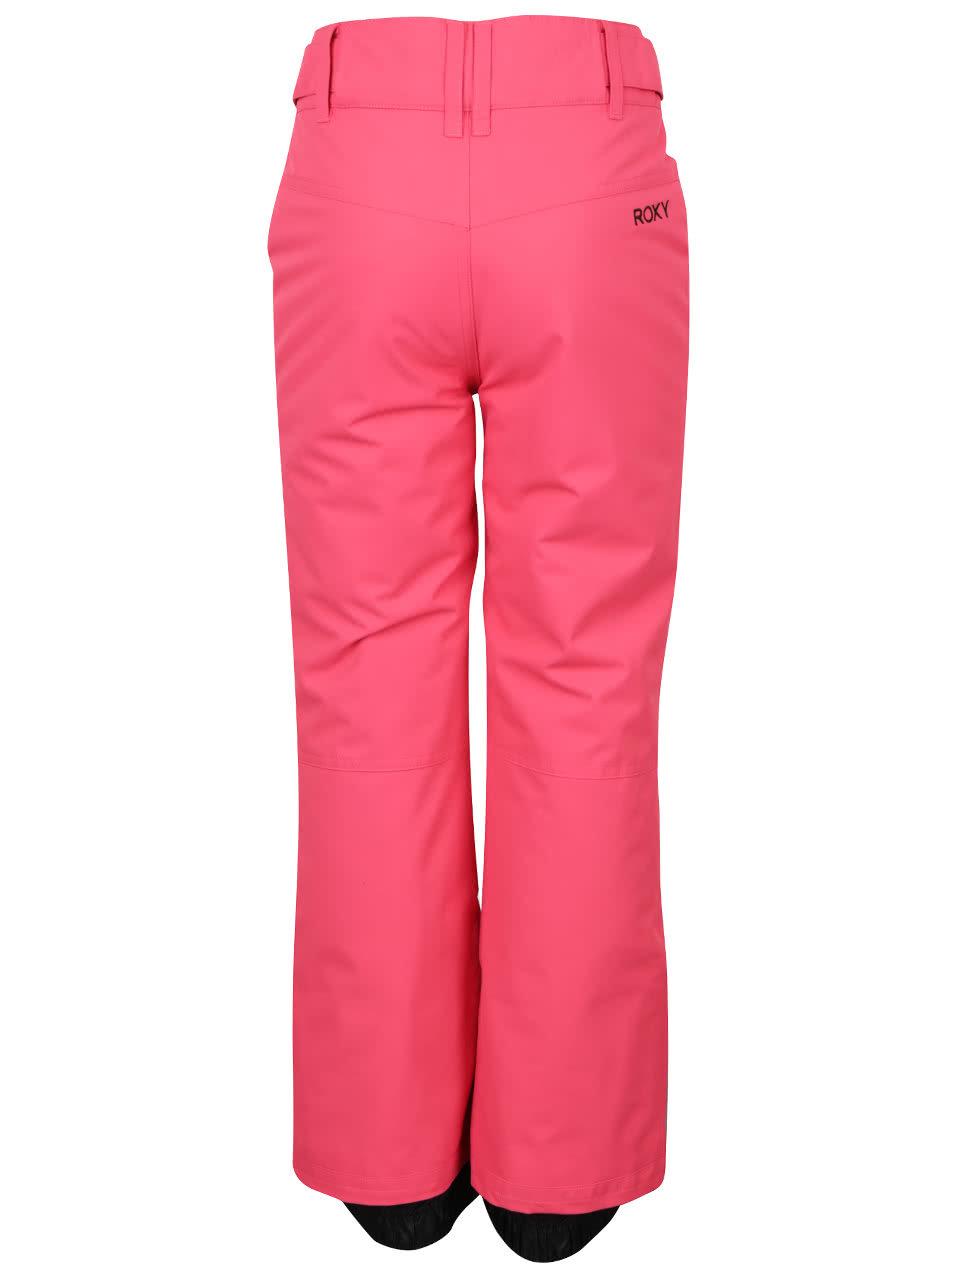 16d02eb2b Ružové dievčenské otepľovačky Roxy | ZOOT.sk